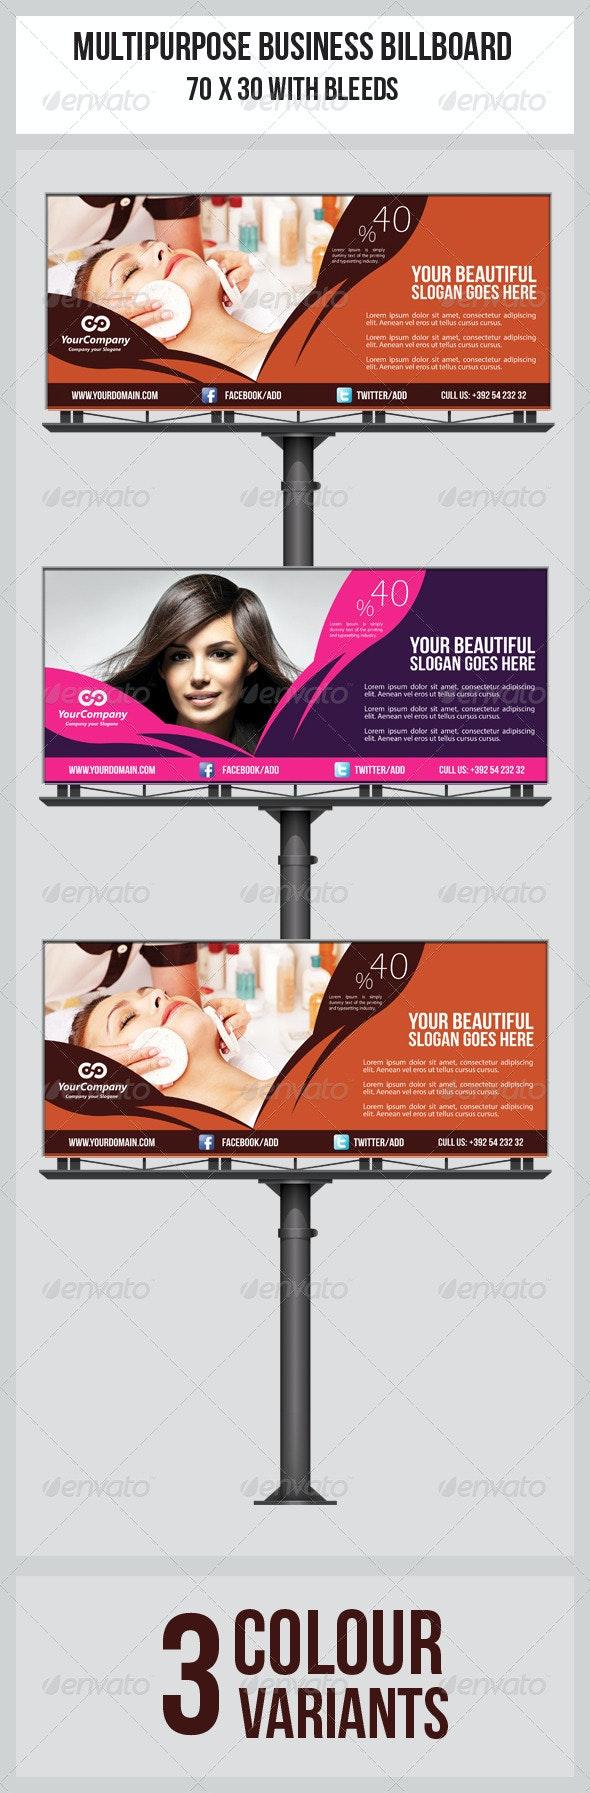 Hair & Beauty Salon Business Billboard  - Signage Print Templates